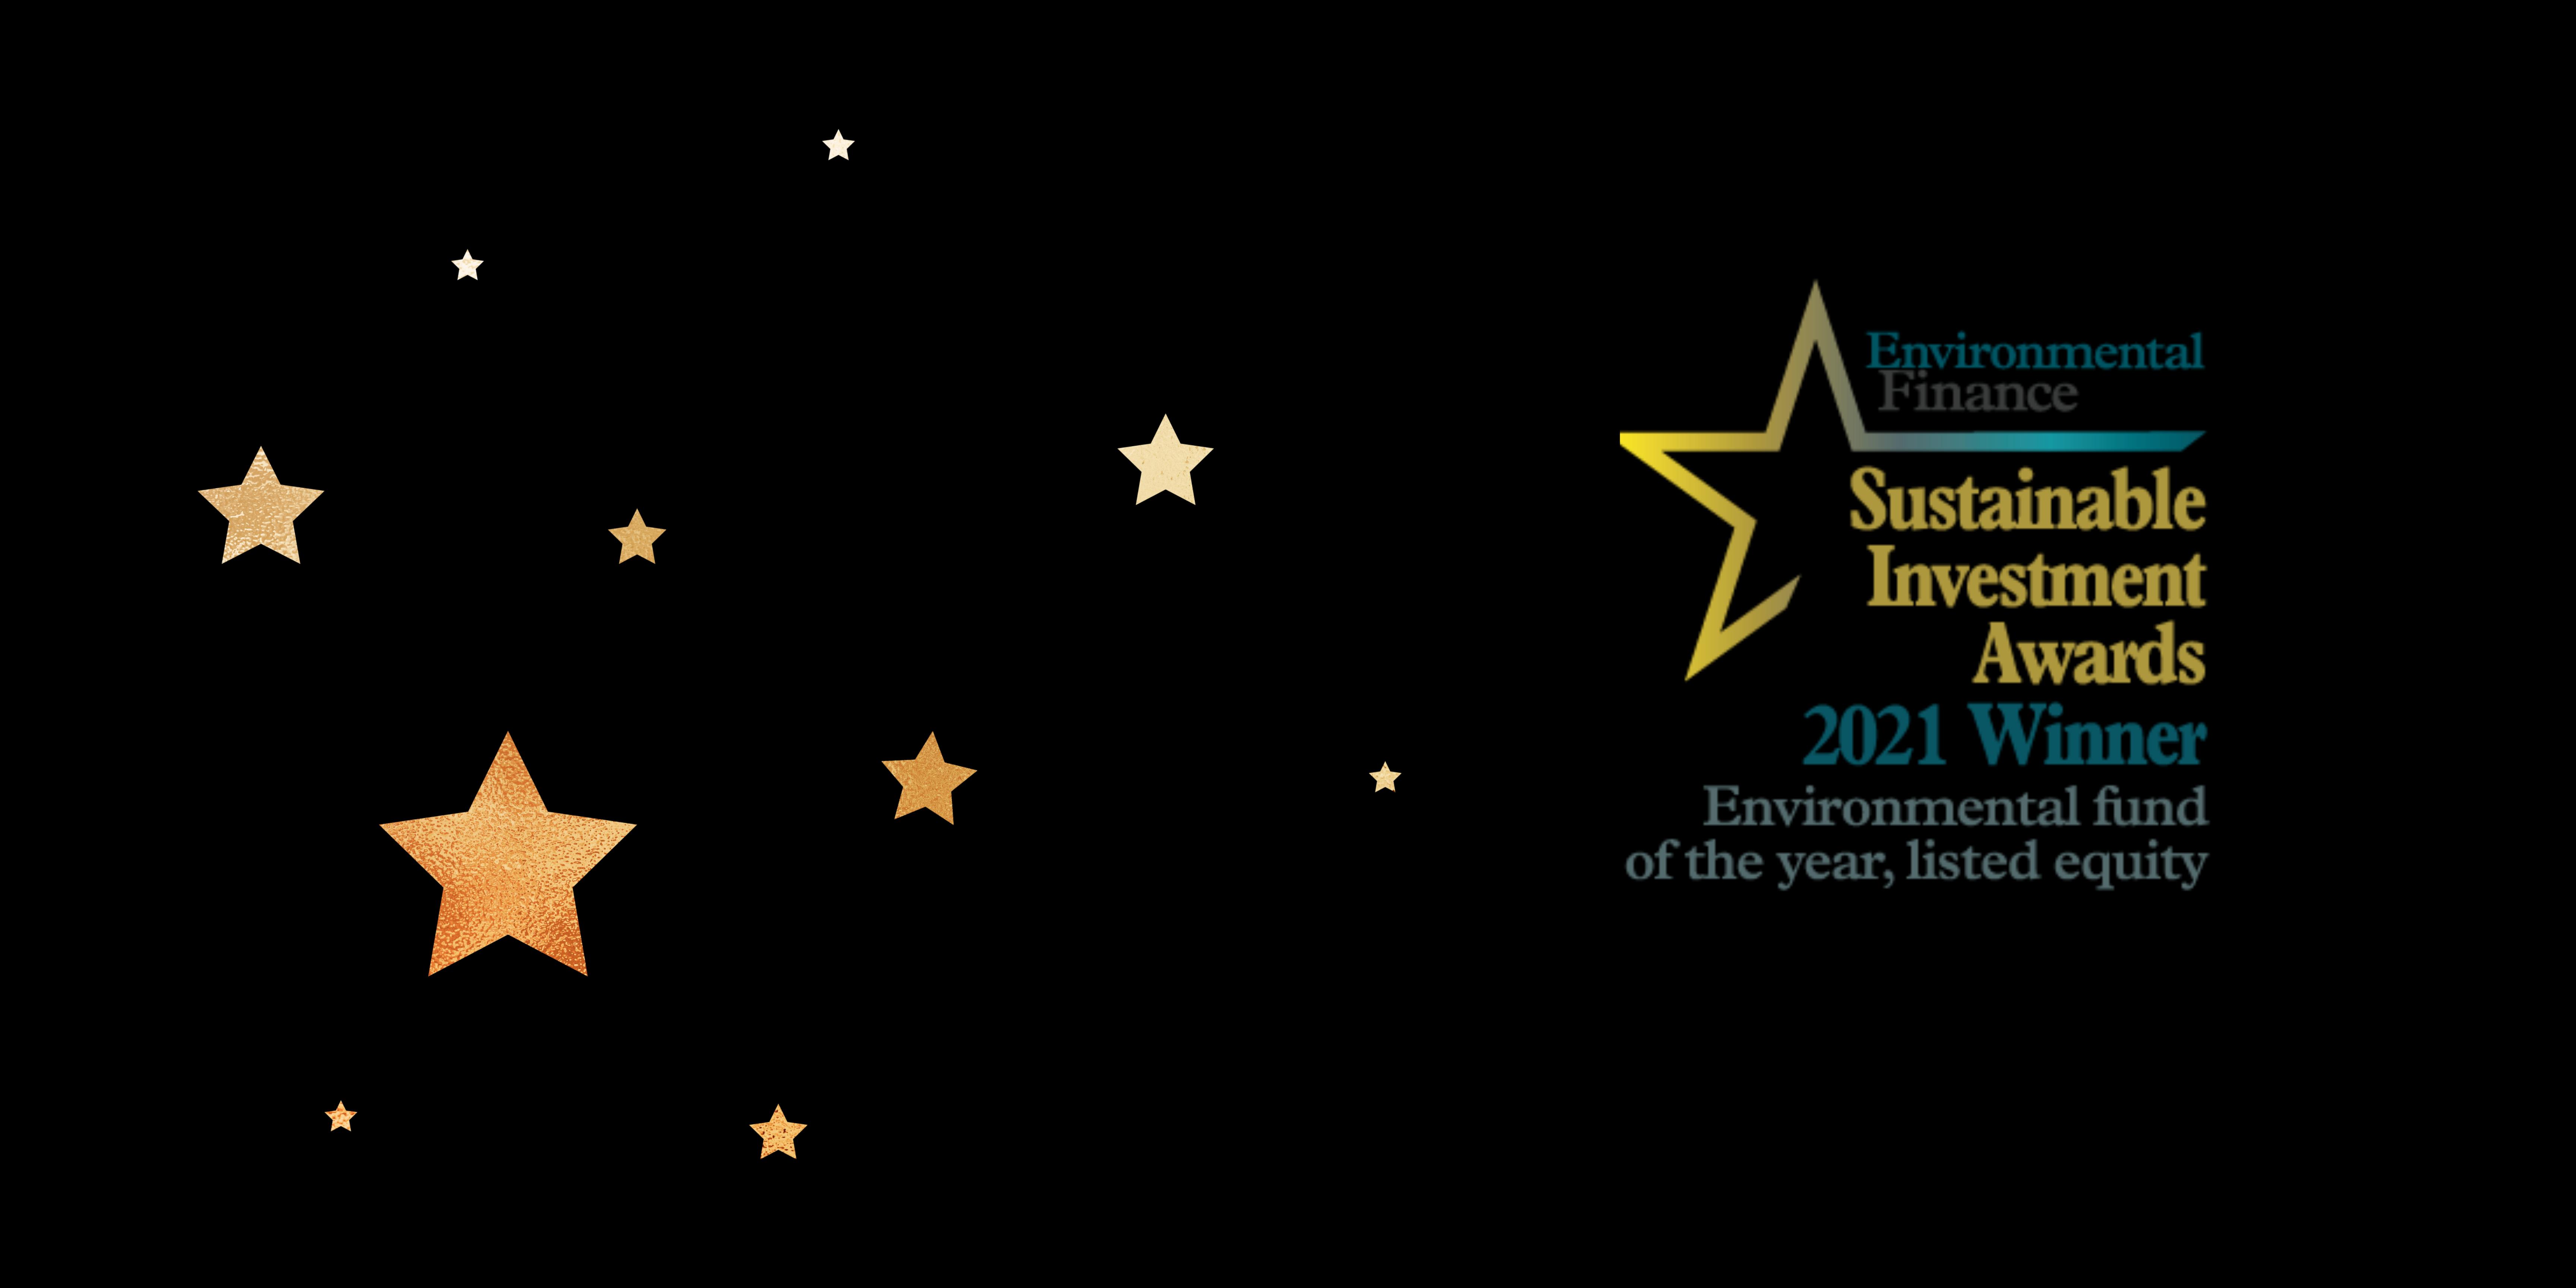 Winner: Environmental Fund of the Year